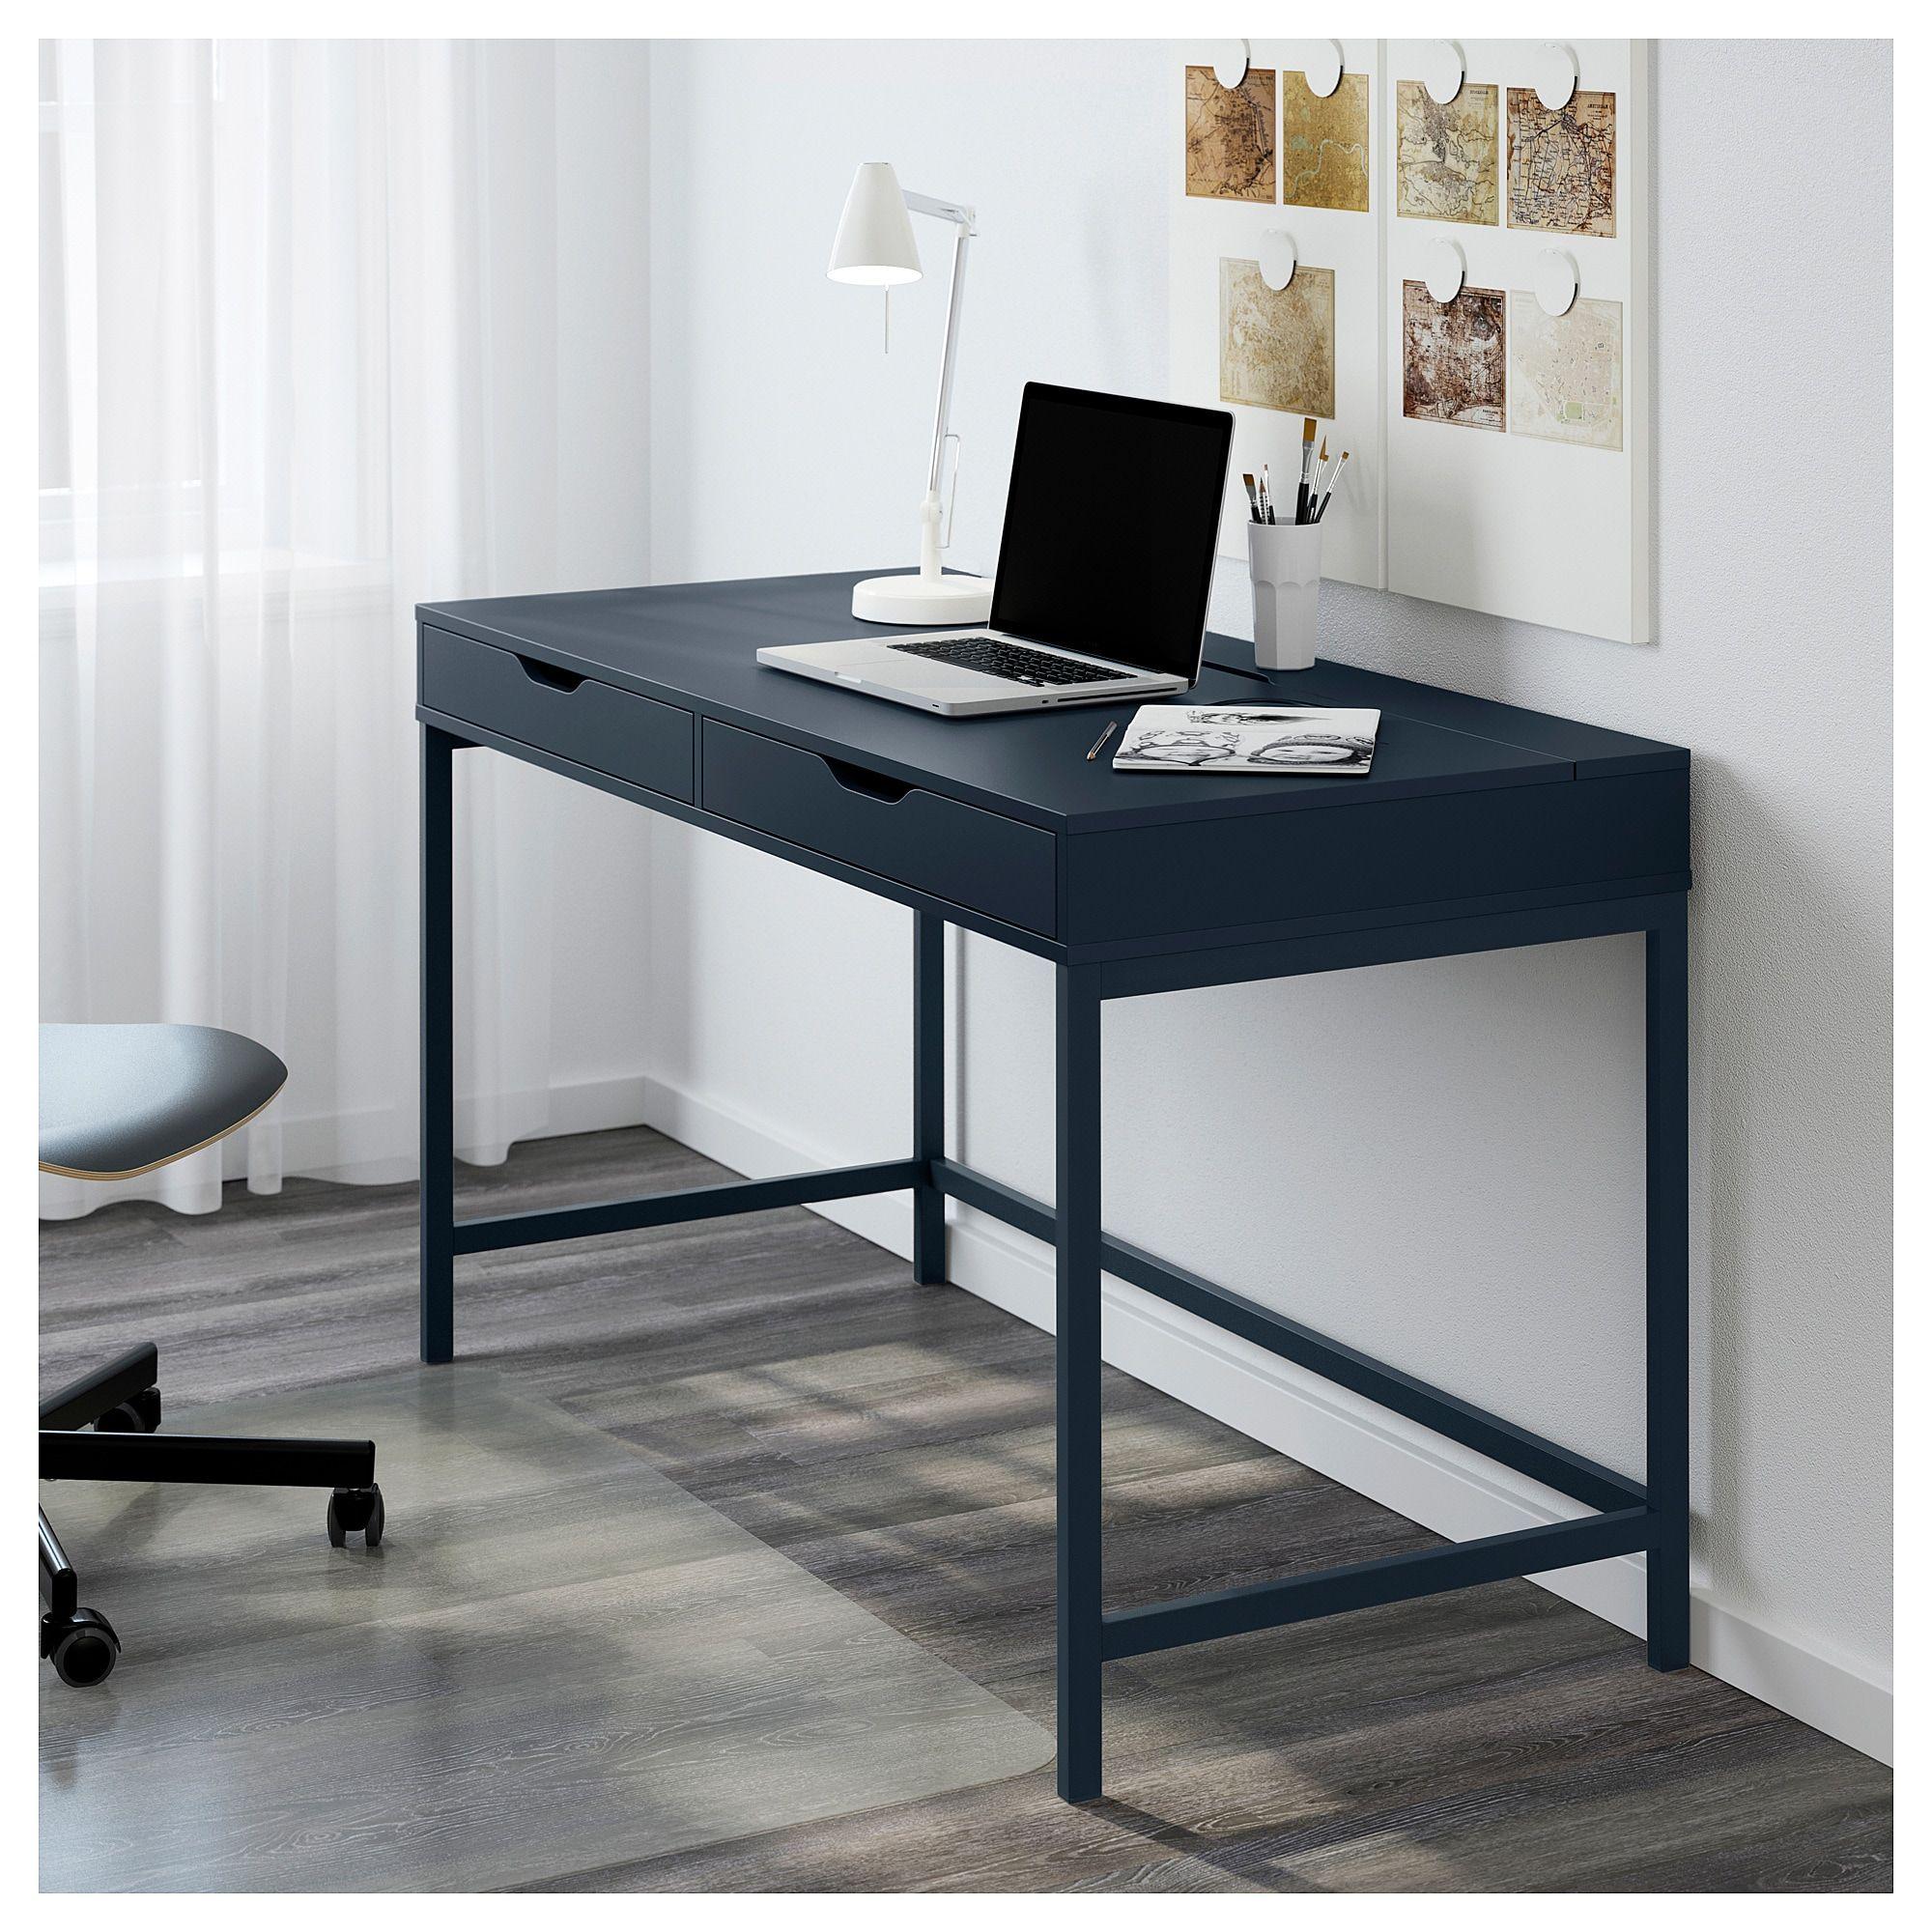 ALEX Desk blue 131x60 cm Alex desk, Grey desk, Ikea